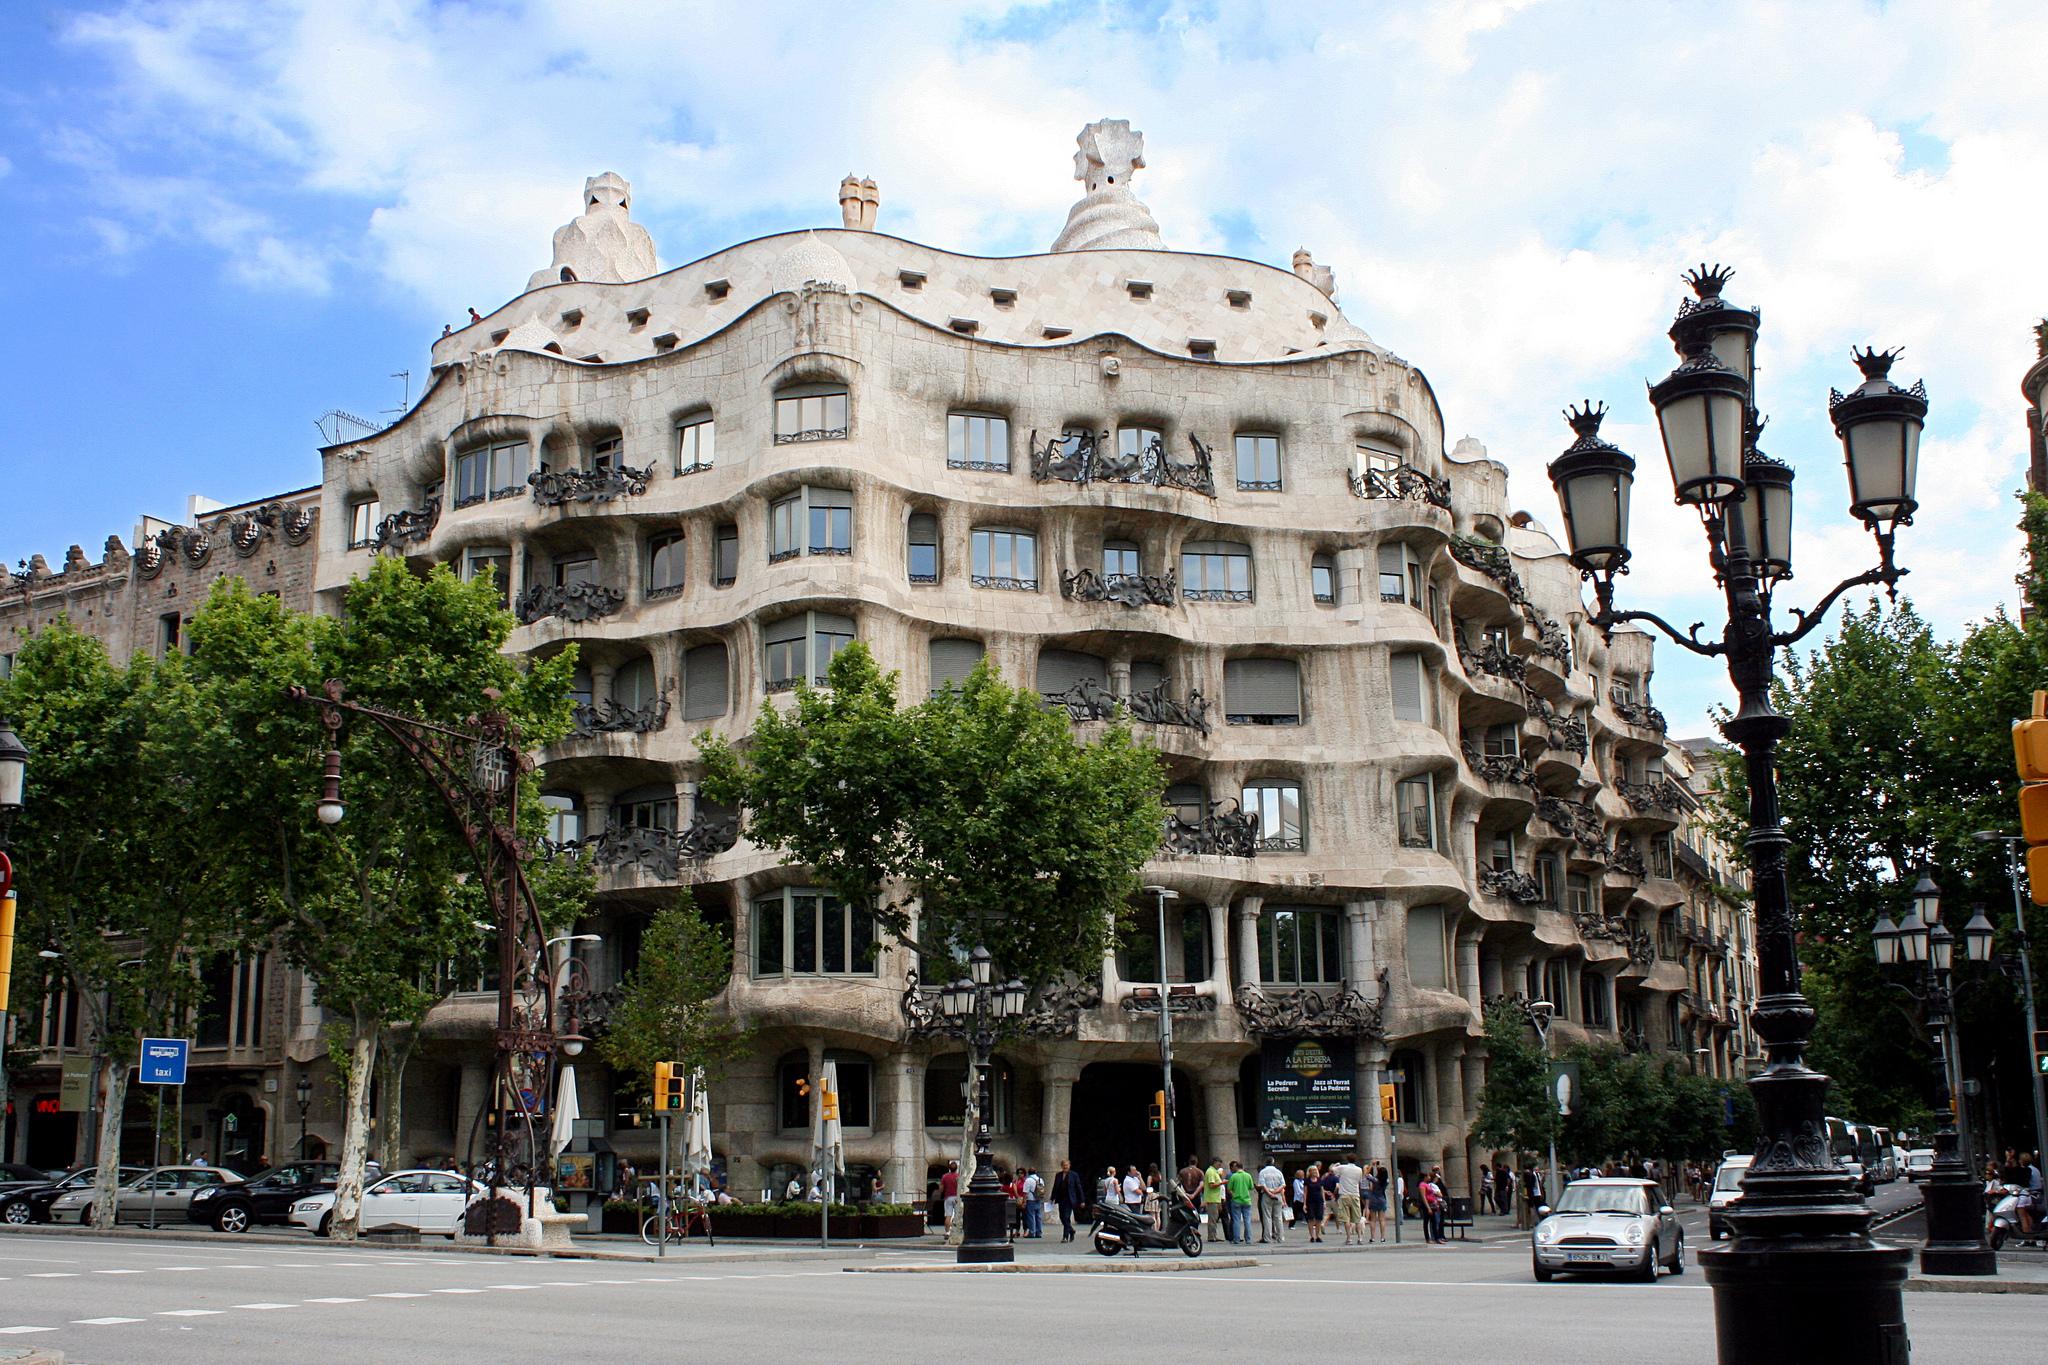 La pedrera barcelona blog - Casa mila la pedrera ...